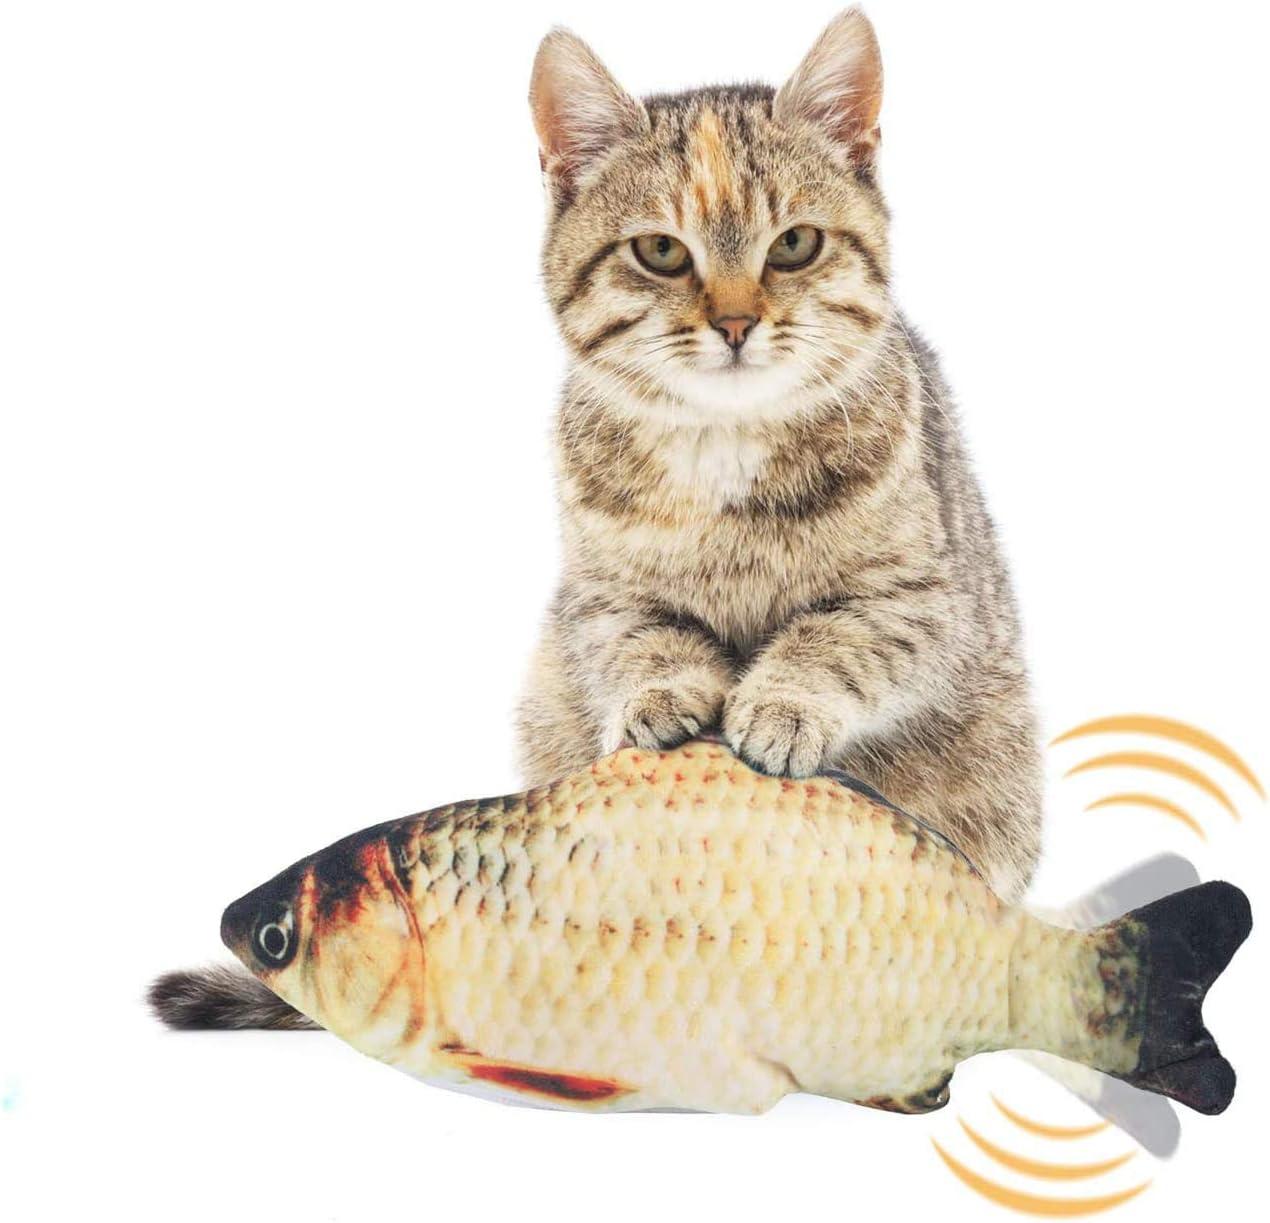 EKKONG Juguete Hierba Gatera,Juguete Interactivo, Simulación de Peces de Peluche Juguetes, Catnip Fish Toys, Juguete Electrico Automático para Gatos Gatito (Type A)